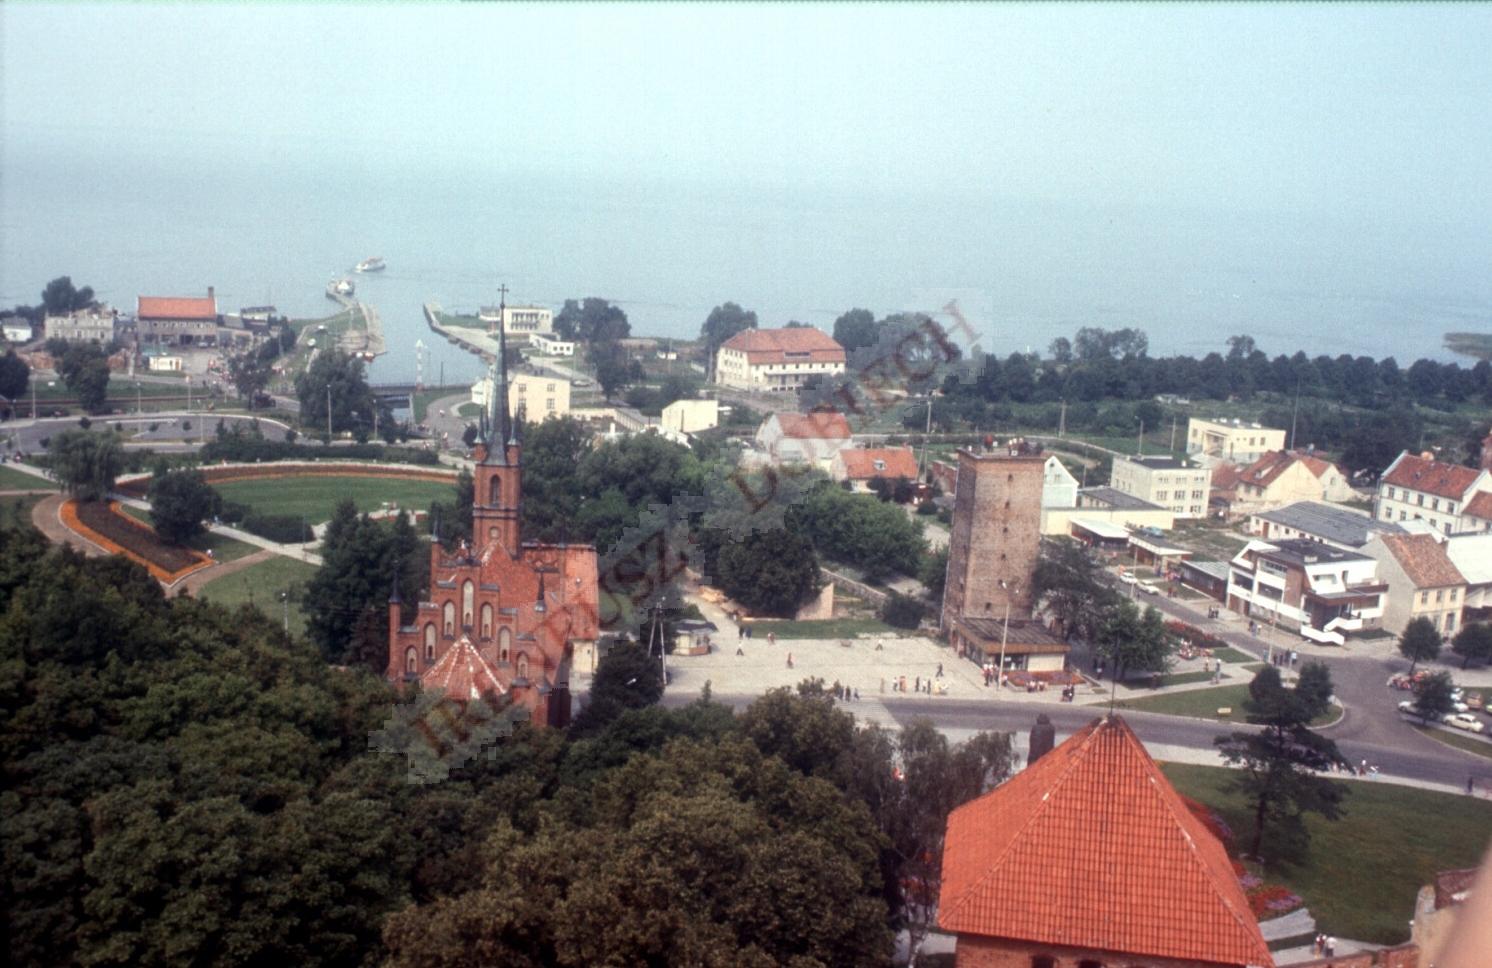 Wejście do portu Frombork